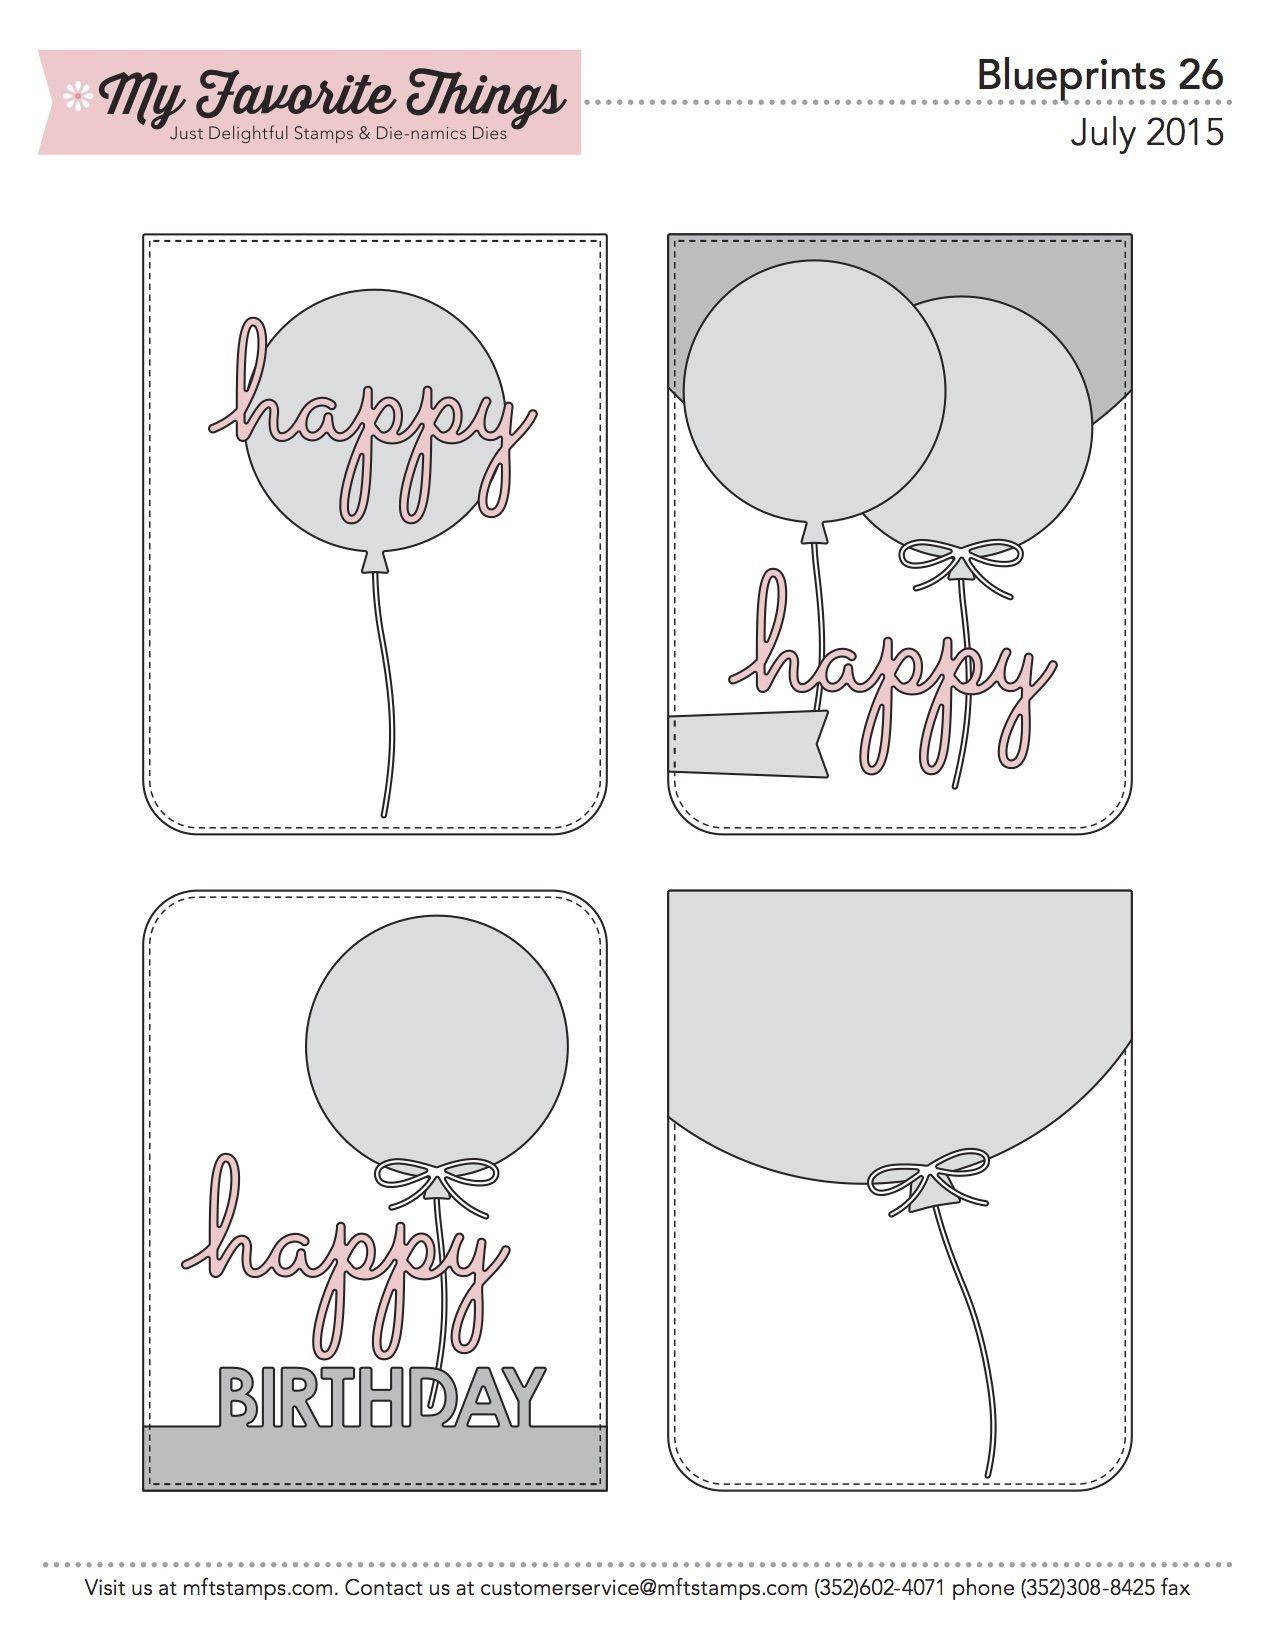 Mft printable resources blueprints sketches cards sketches birthdays bookmarktalkfo Choice Image